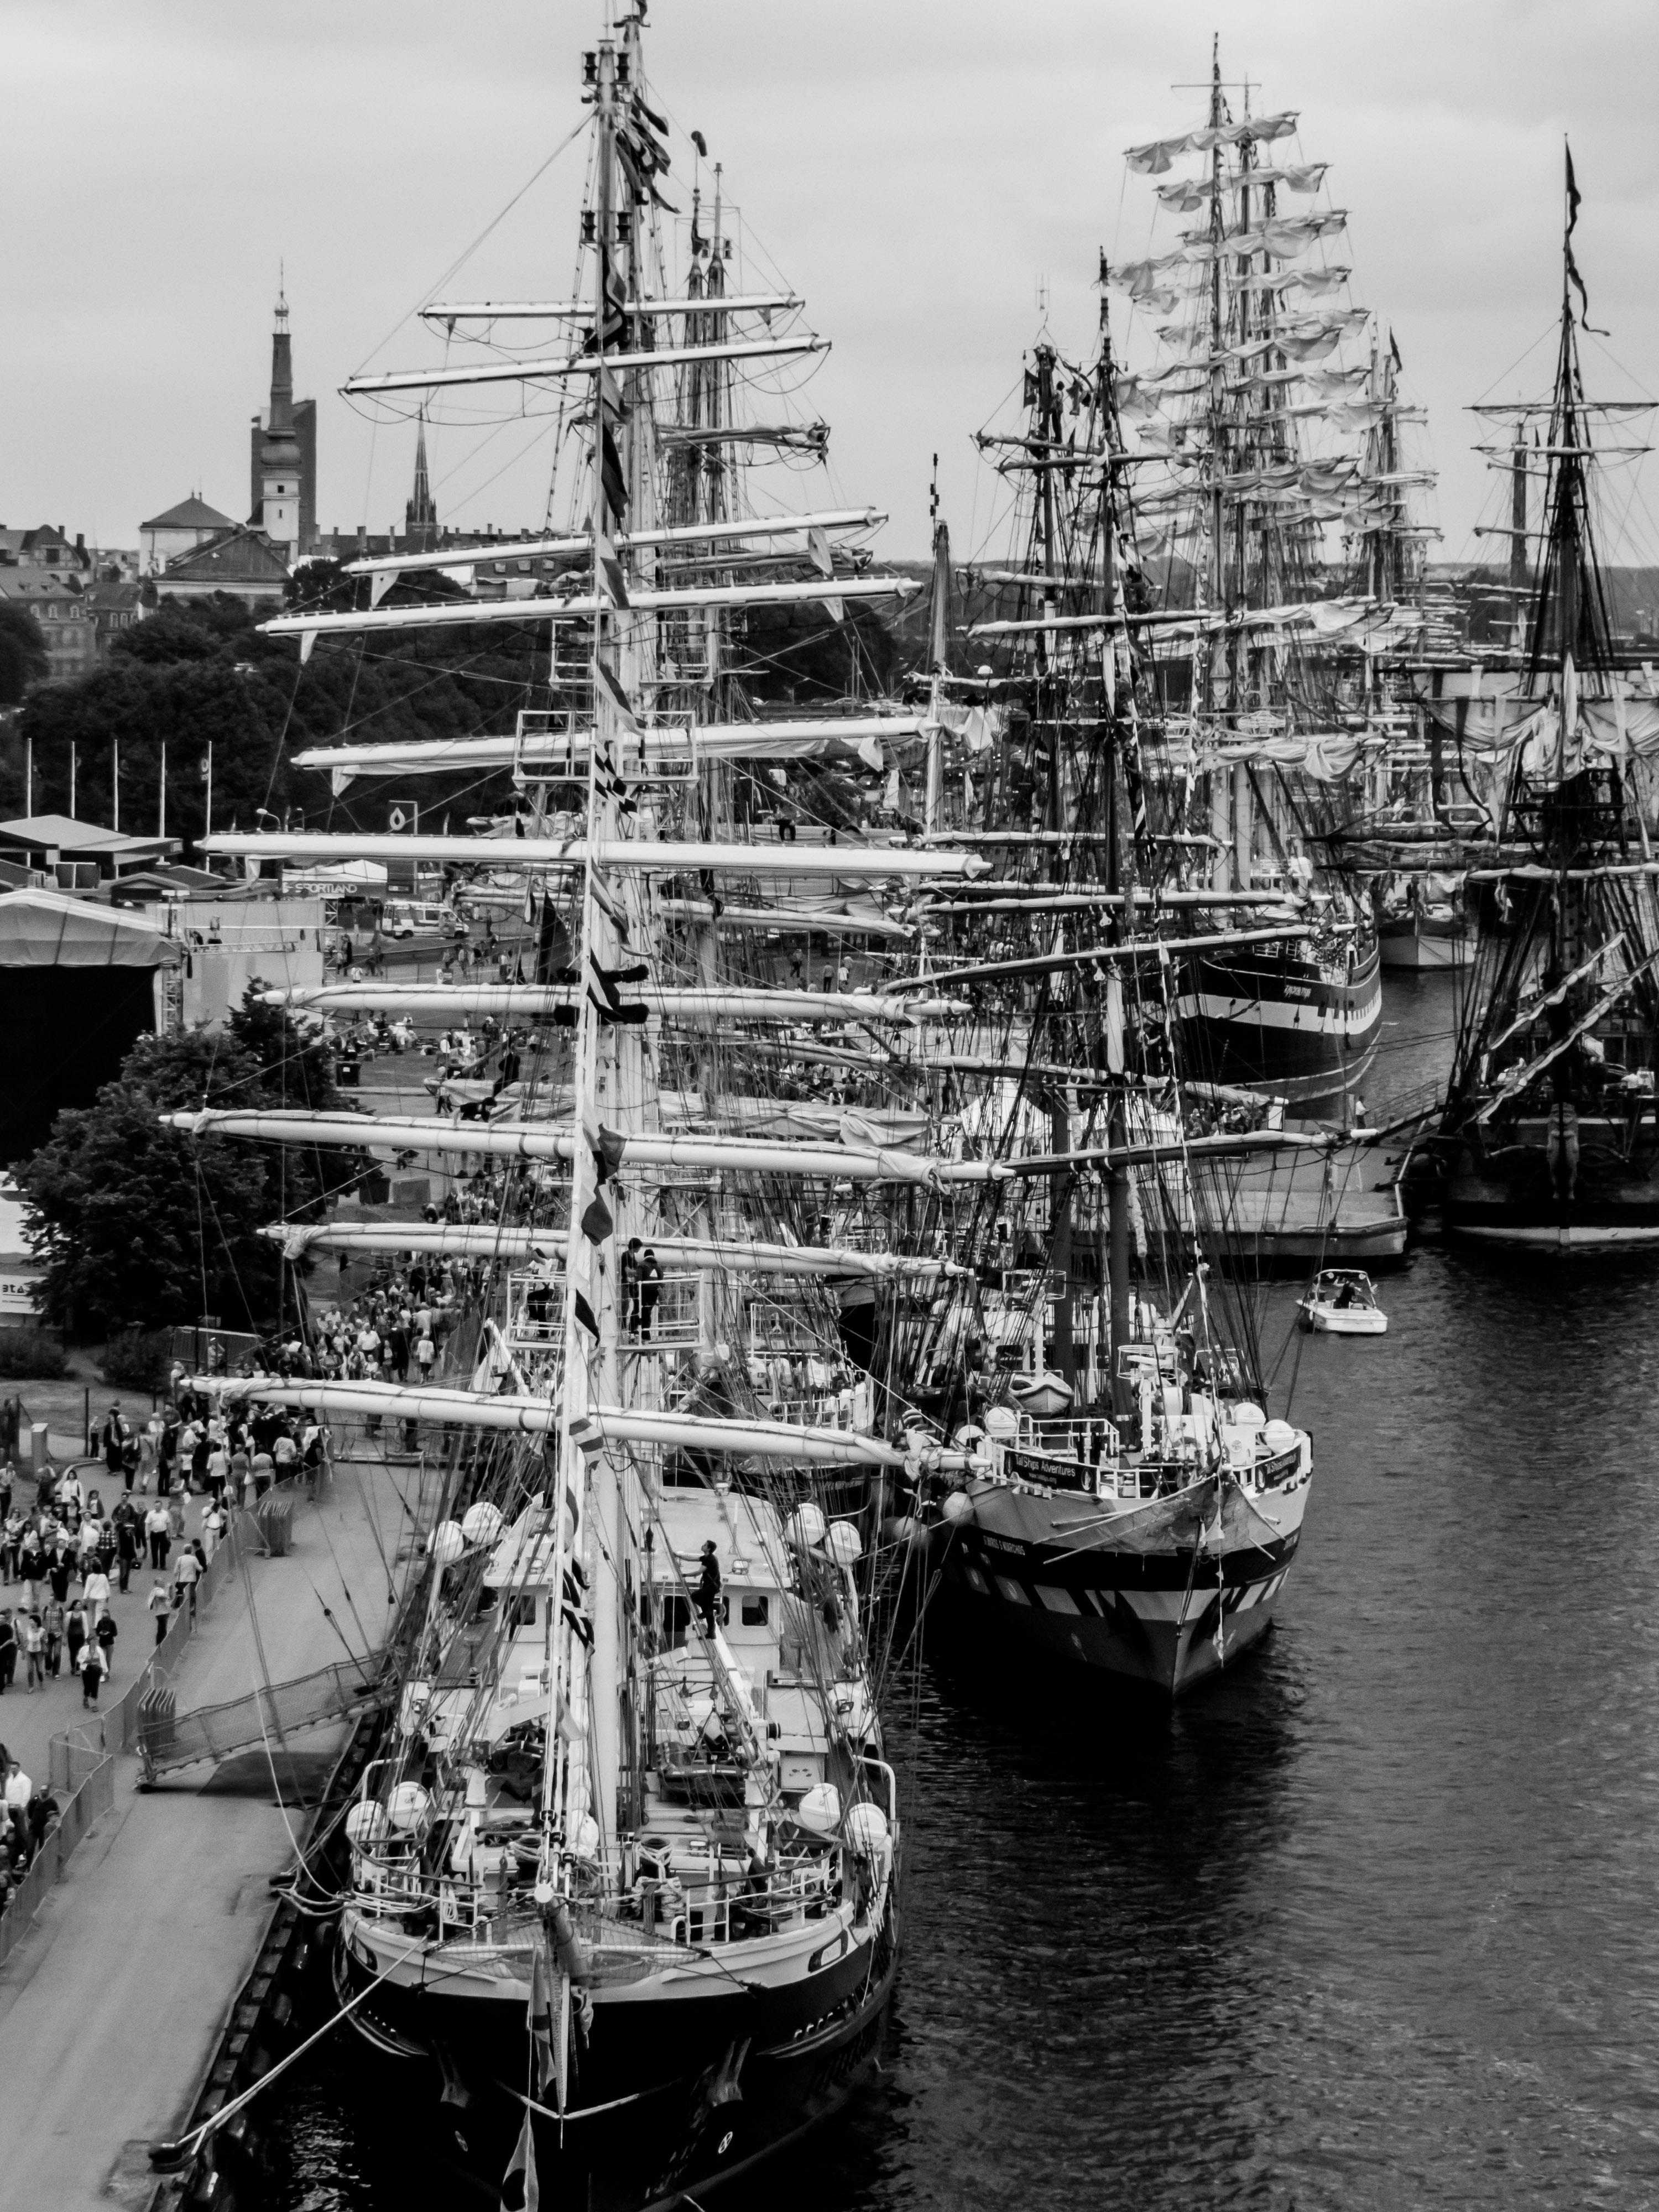 Sailing ships masts, 2013, River, Vessel, Theme, HQ Photo